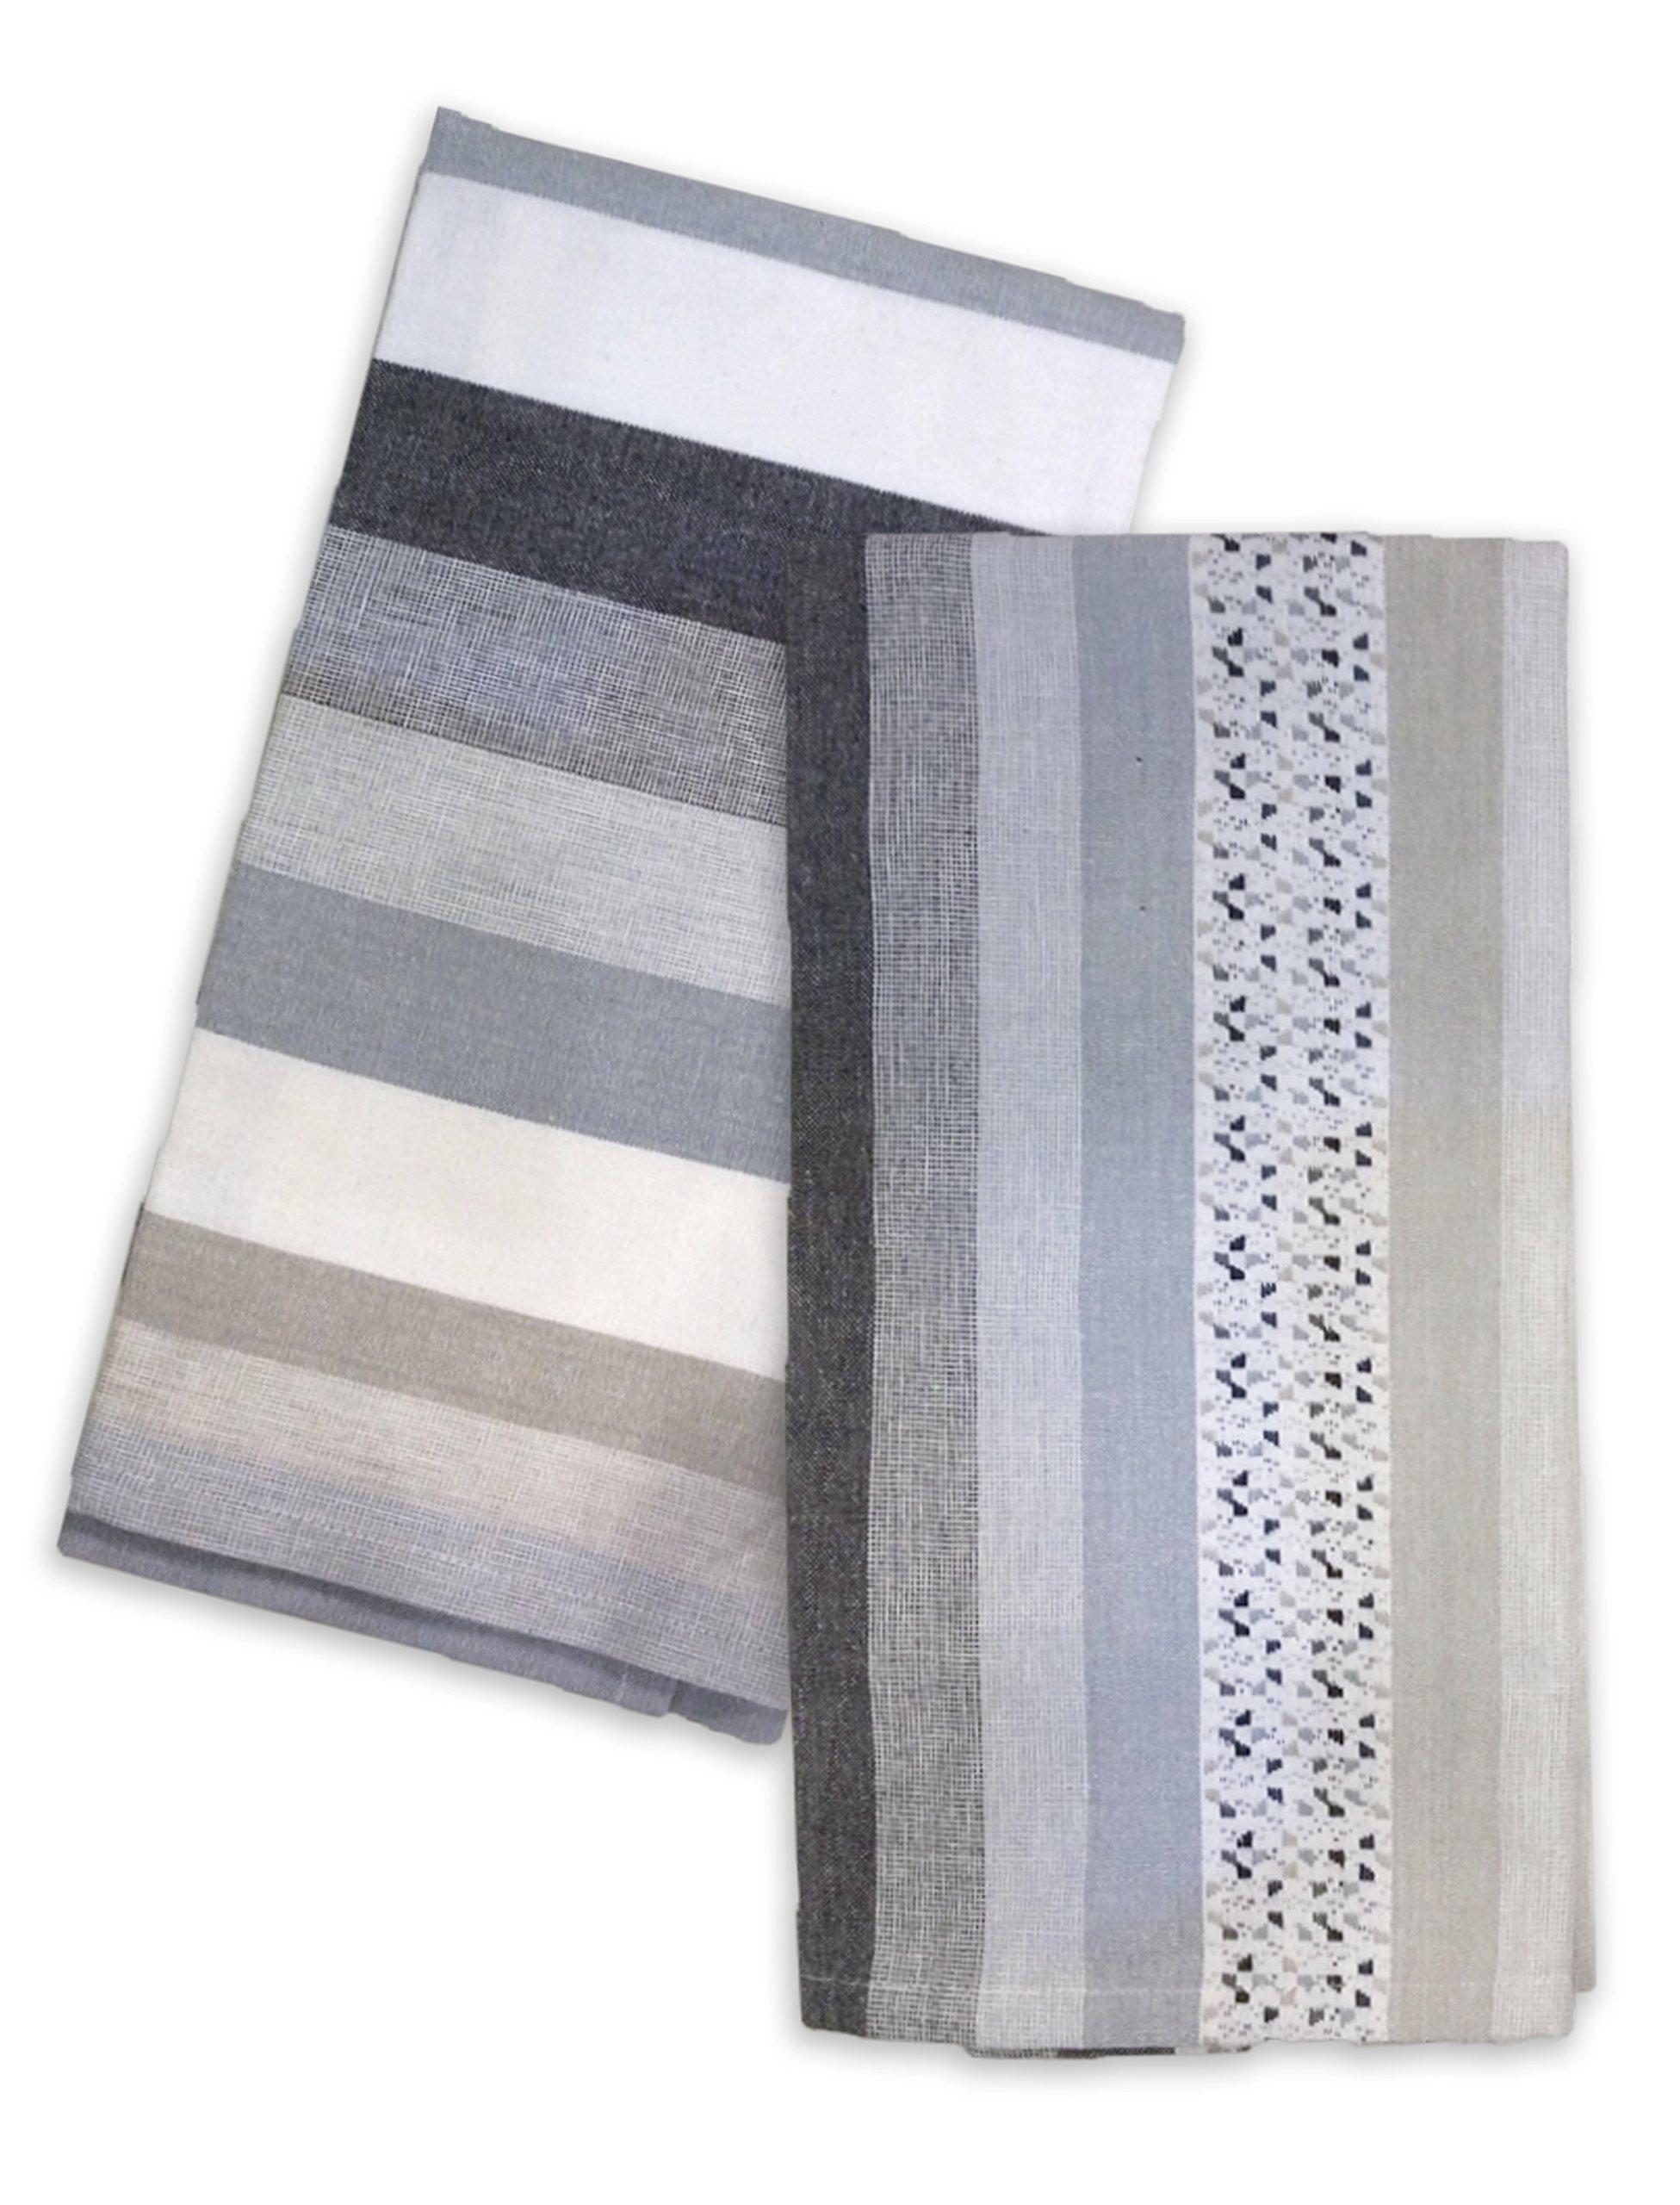 Hotel'' Fleck 2 Pack Kitchen Towel Set, 18x28, Grey, 2 Piece